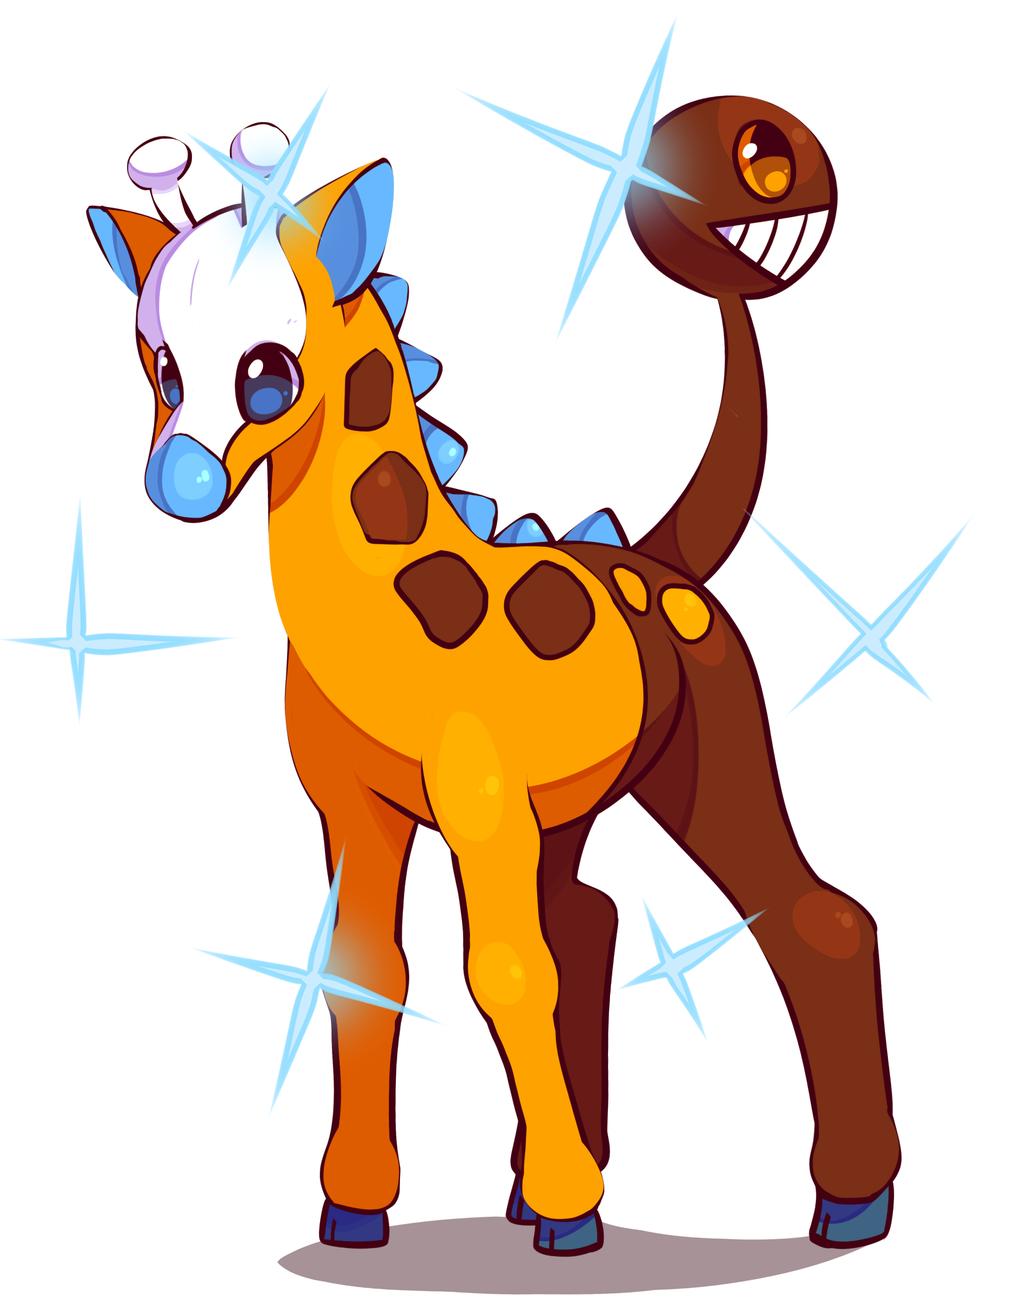 Shiny Girafarig by Takurapi on DeviantArt.